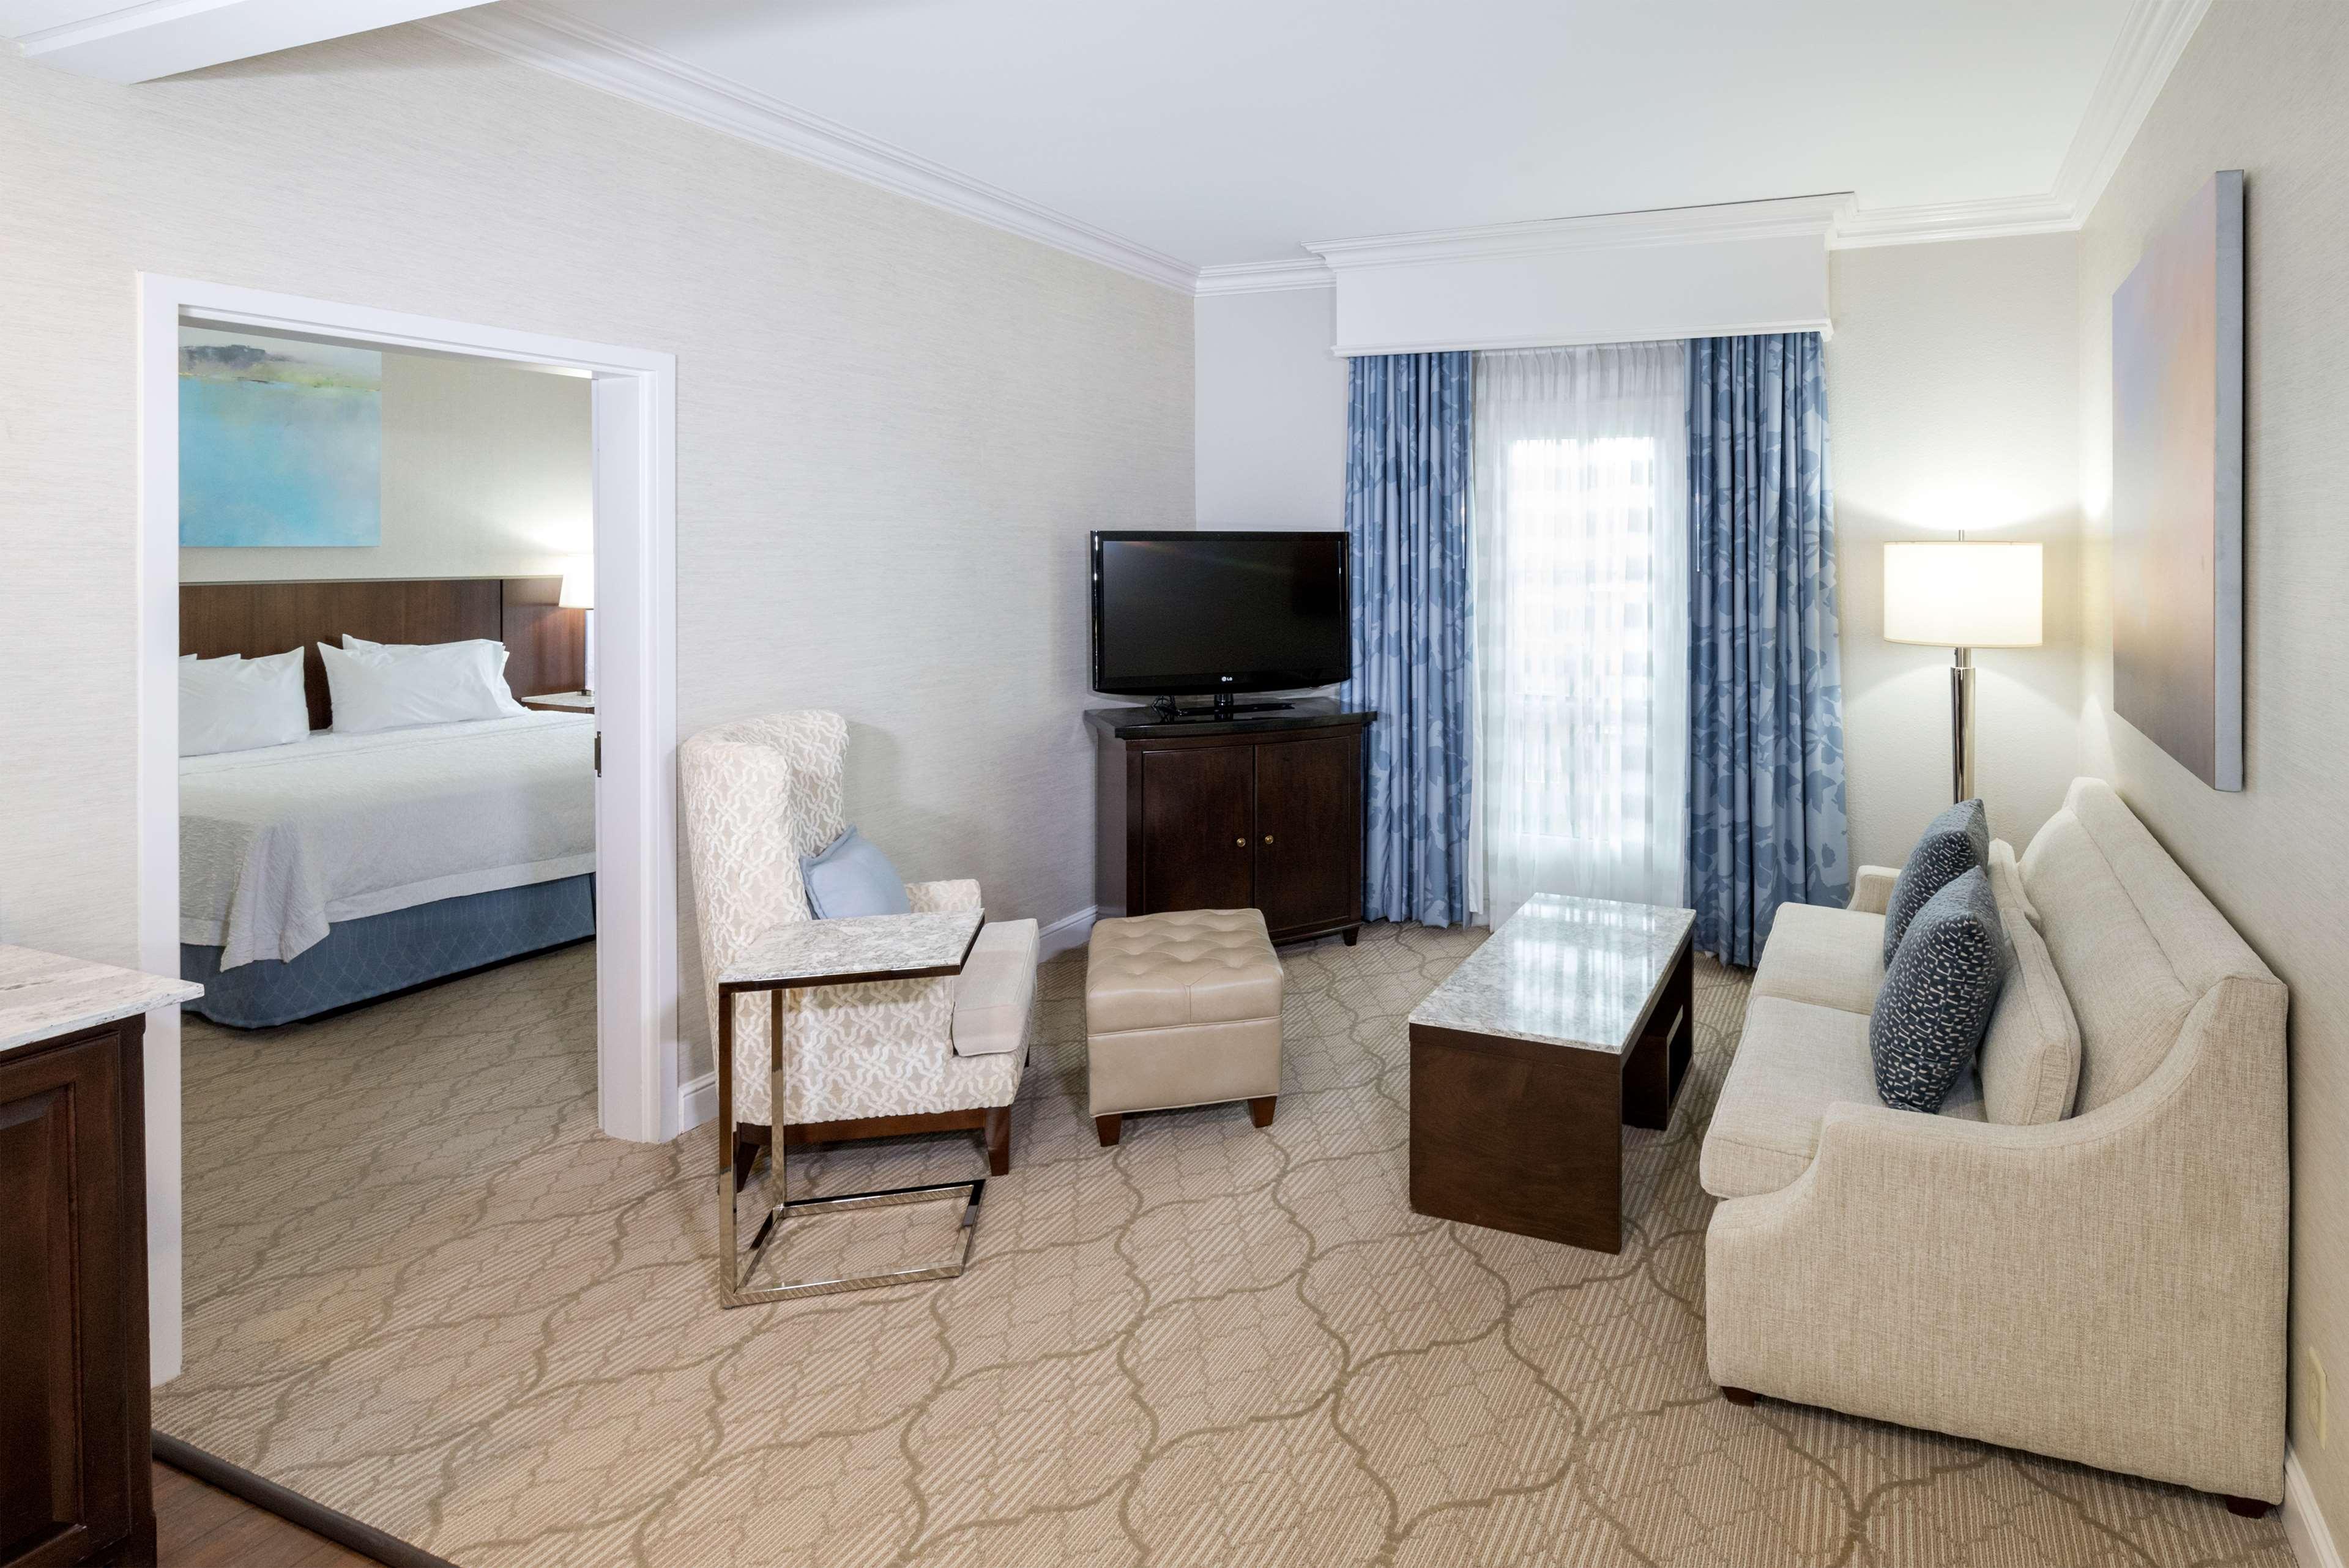 Hampton Inn & Suites Charlotte/South Park at Phillips Place image 28